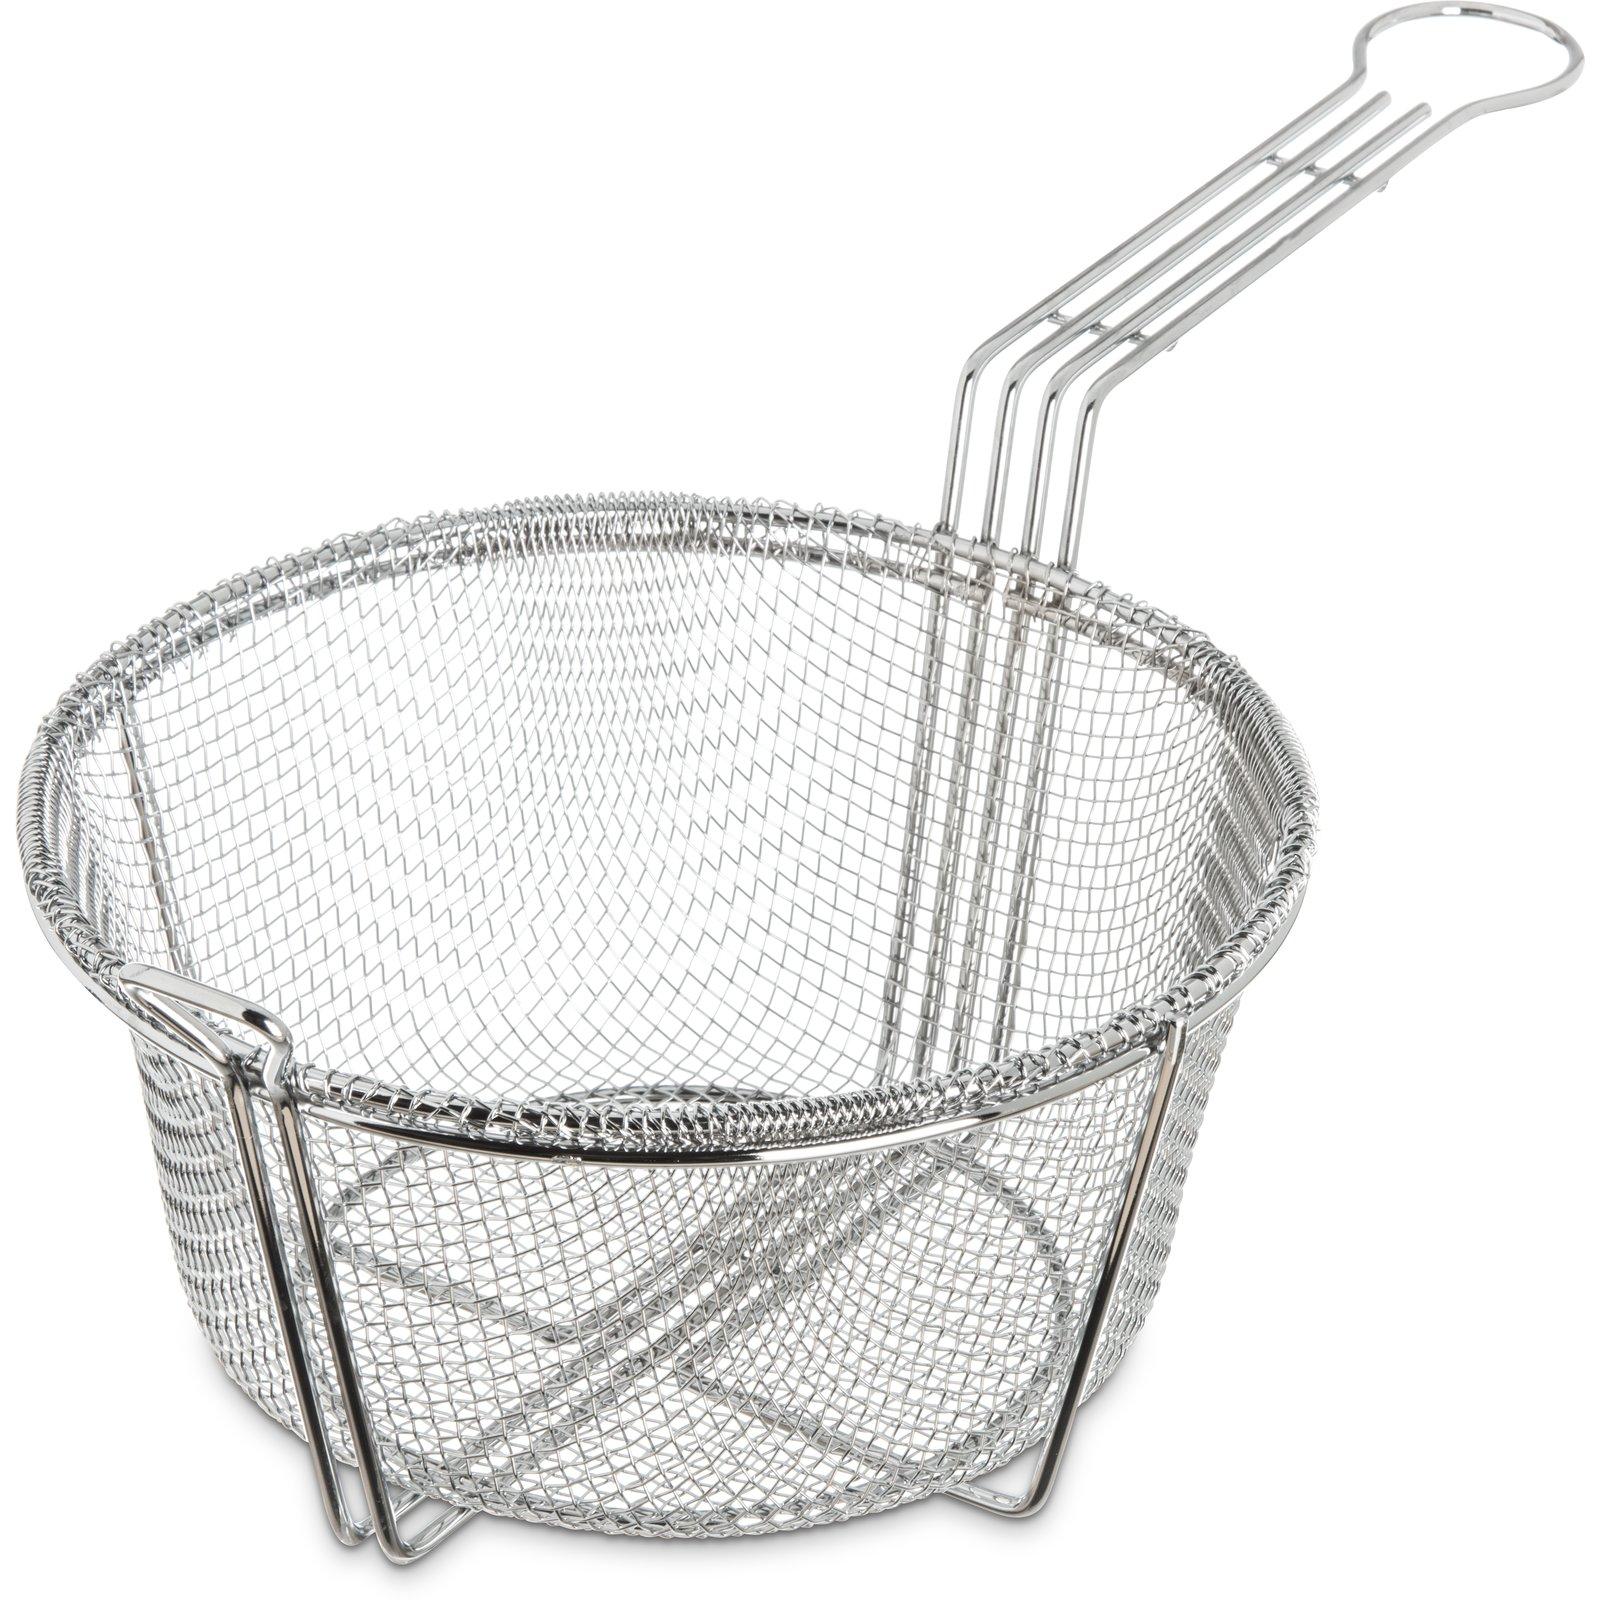 601000 Mesh Fryer Basket 8 3 4 Chrome Carlisle Foodservice Products